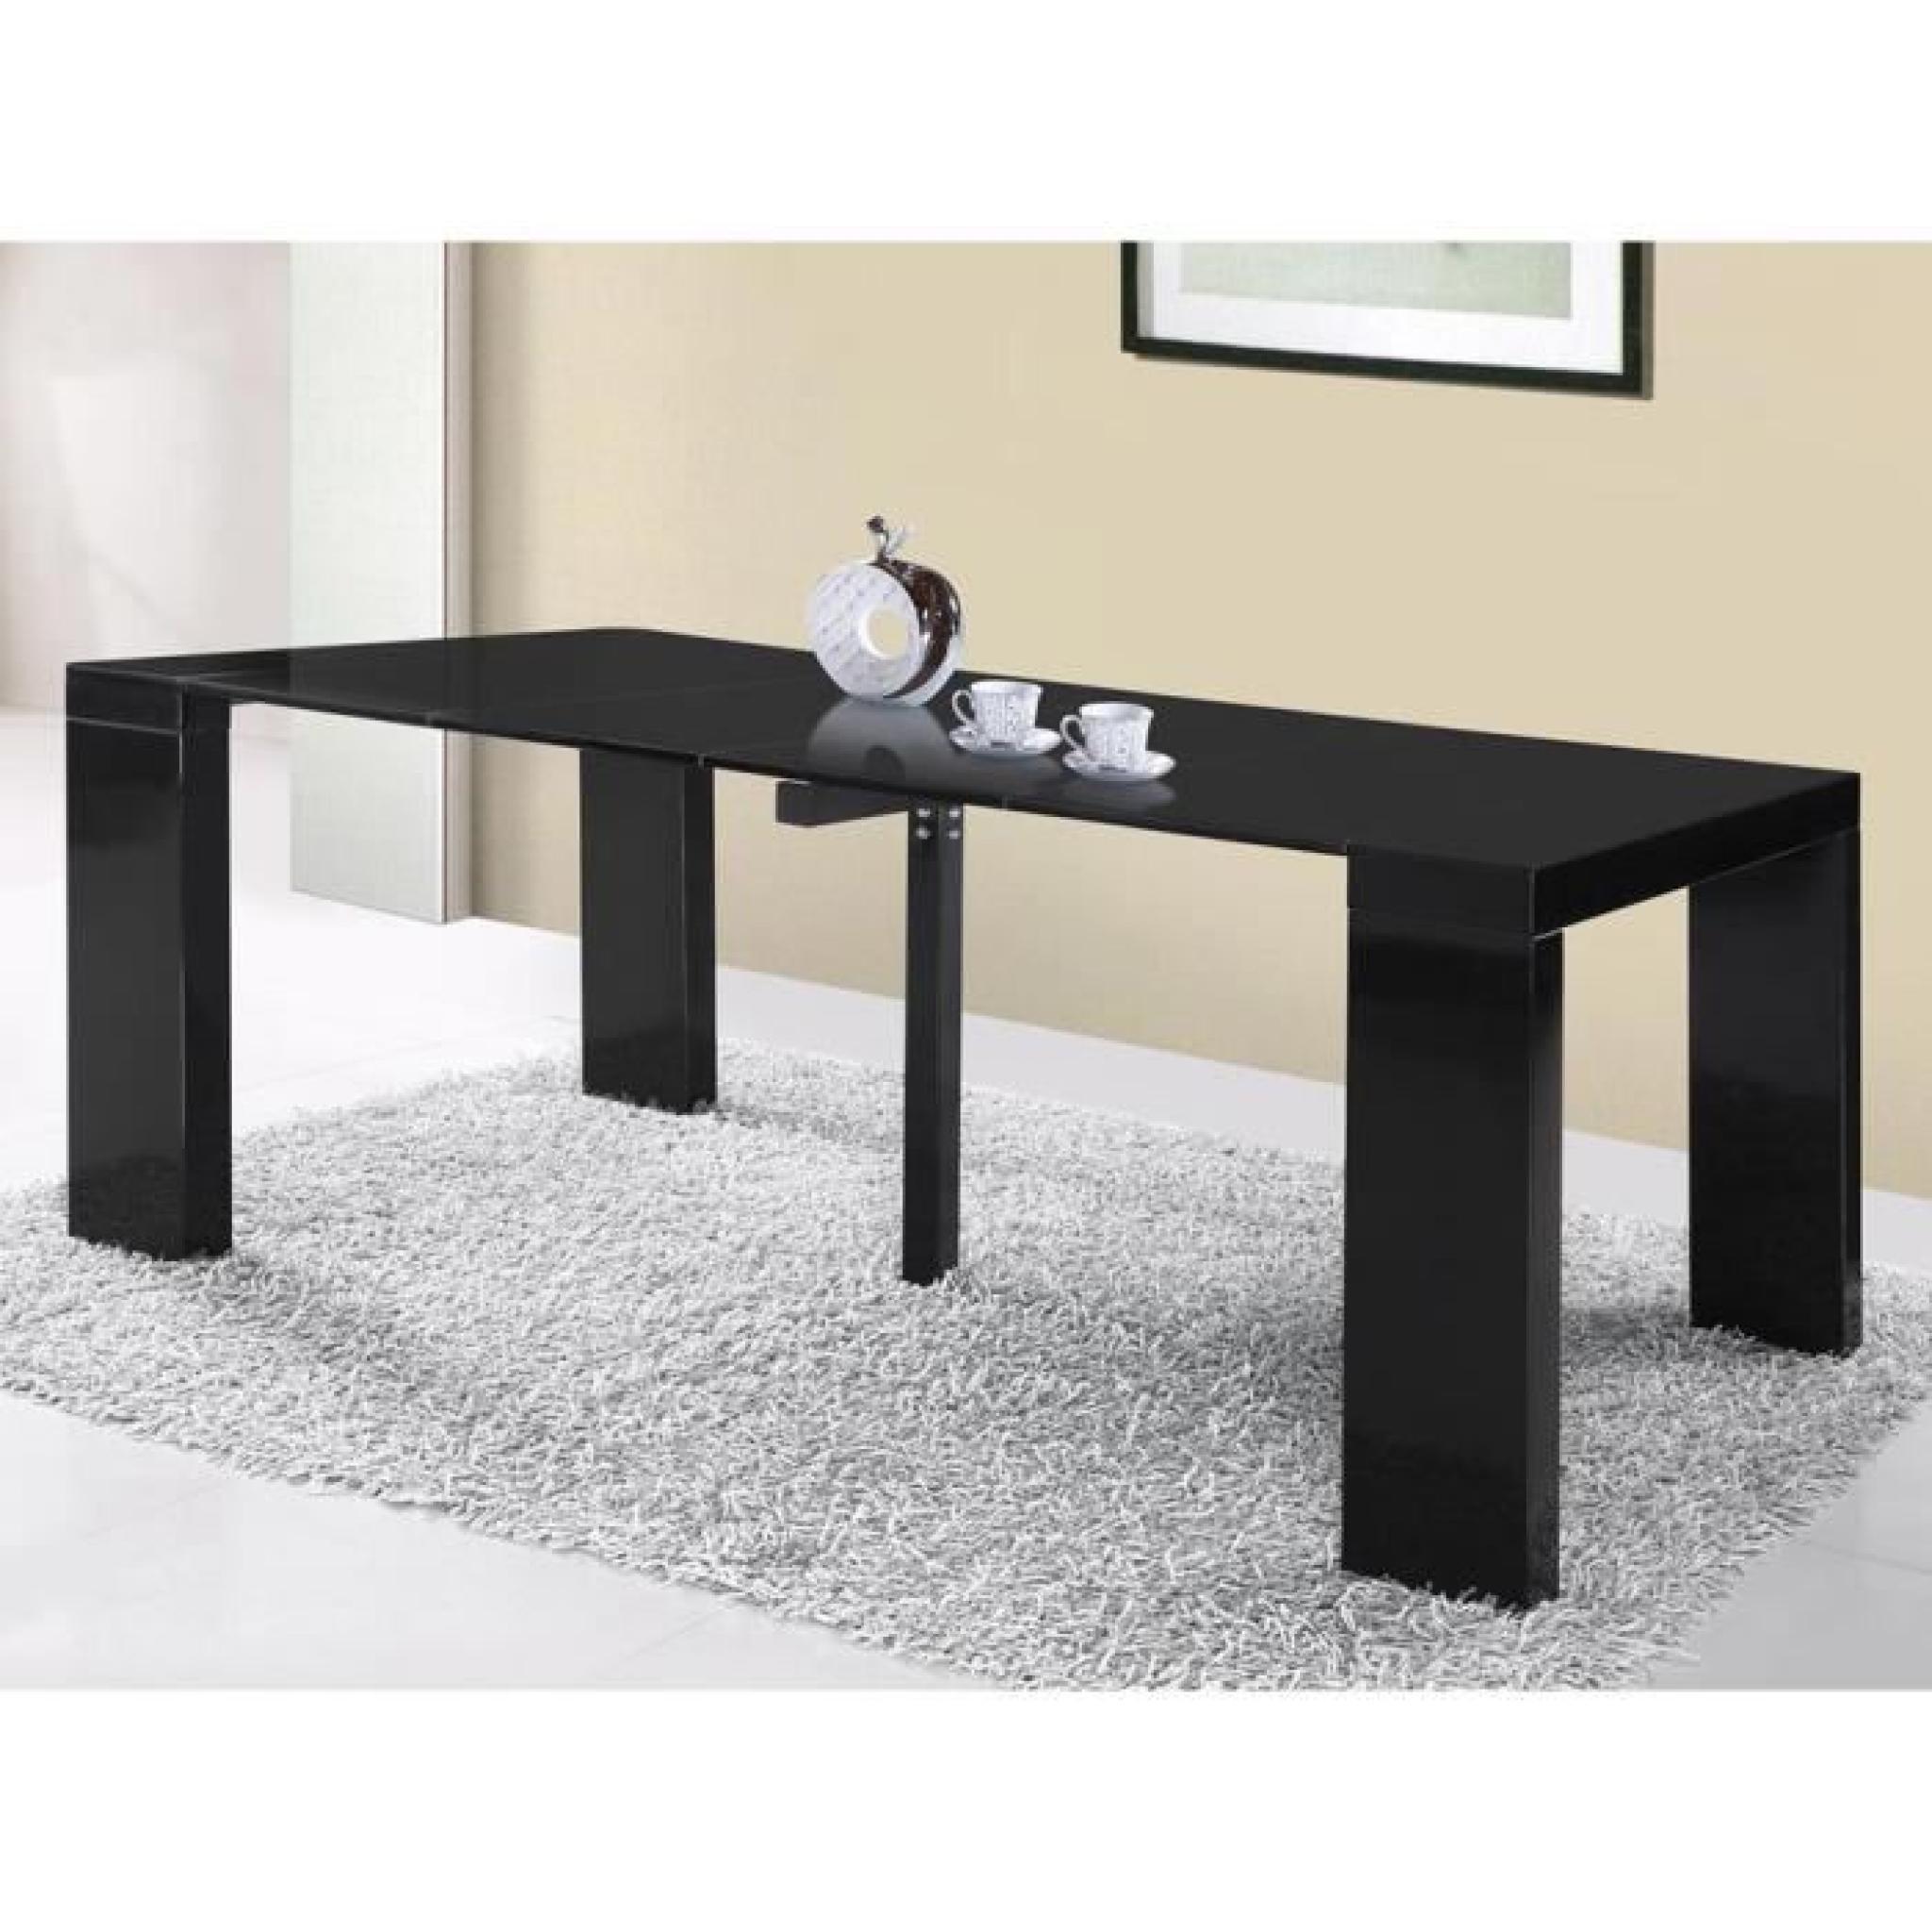 C 94 X Repas Dina Table 20040 Extensible 75 9EDH2I